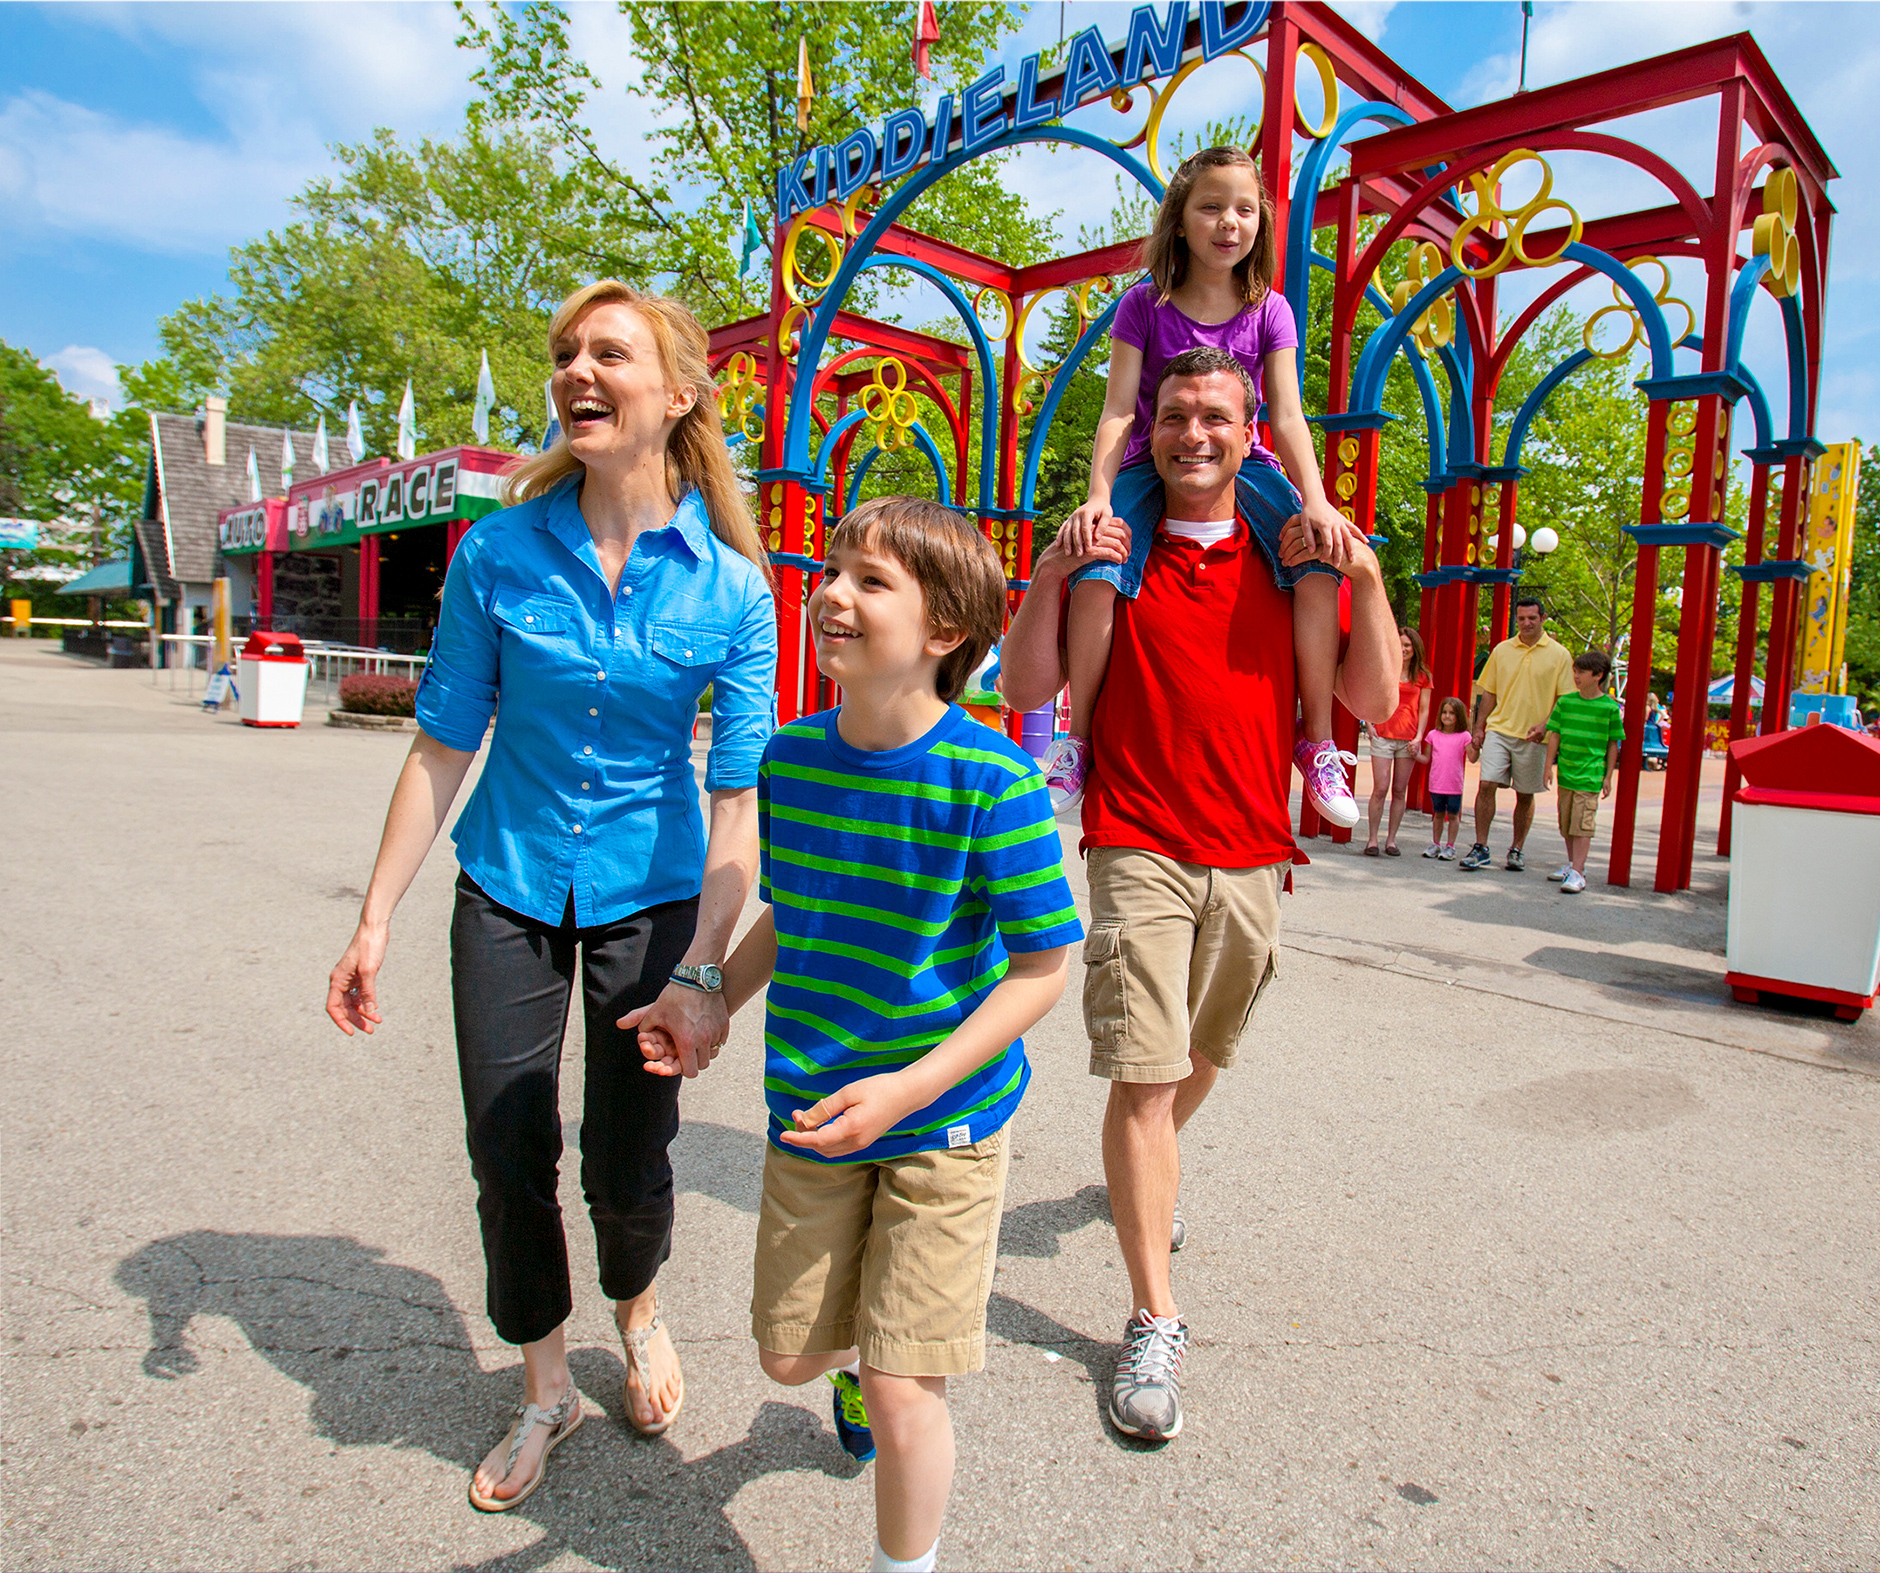 Kennywood Amusement Park, print campaign